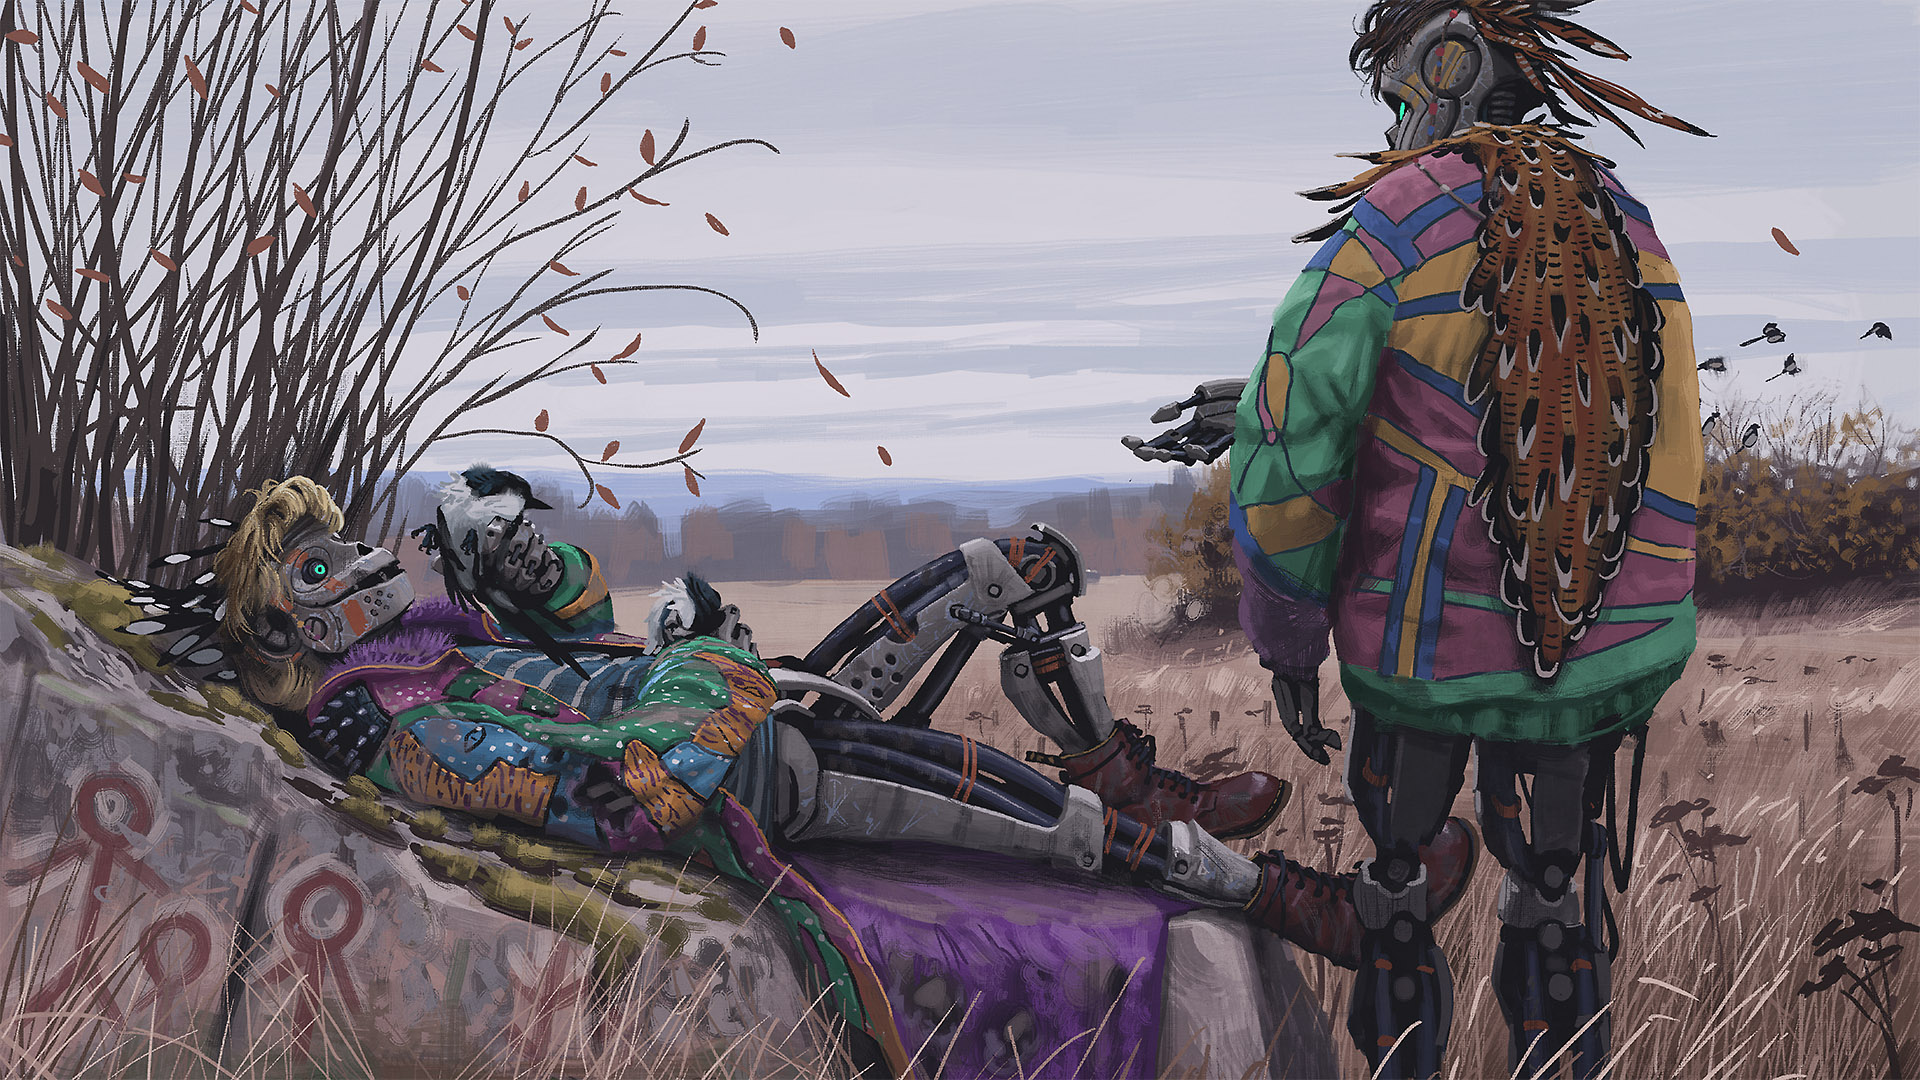 simon_stalenhag_digital_painting1